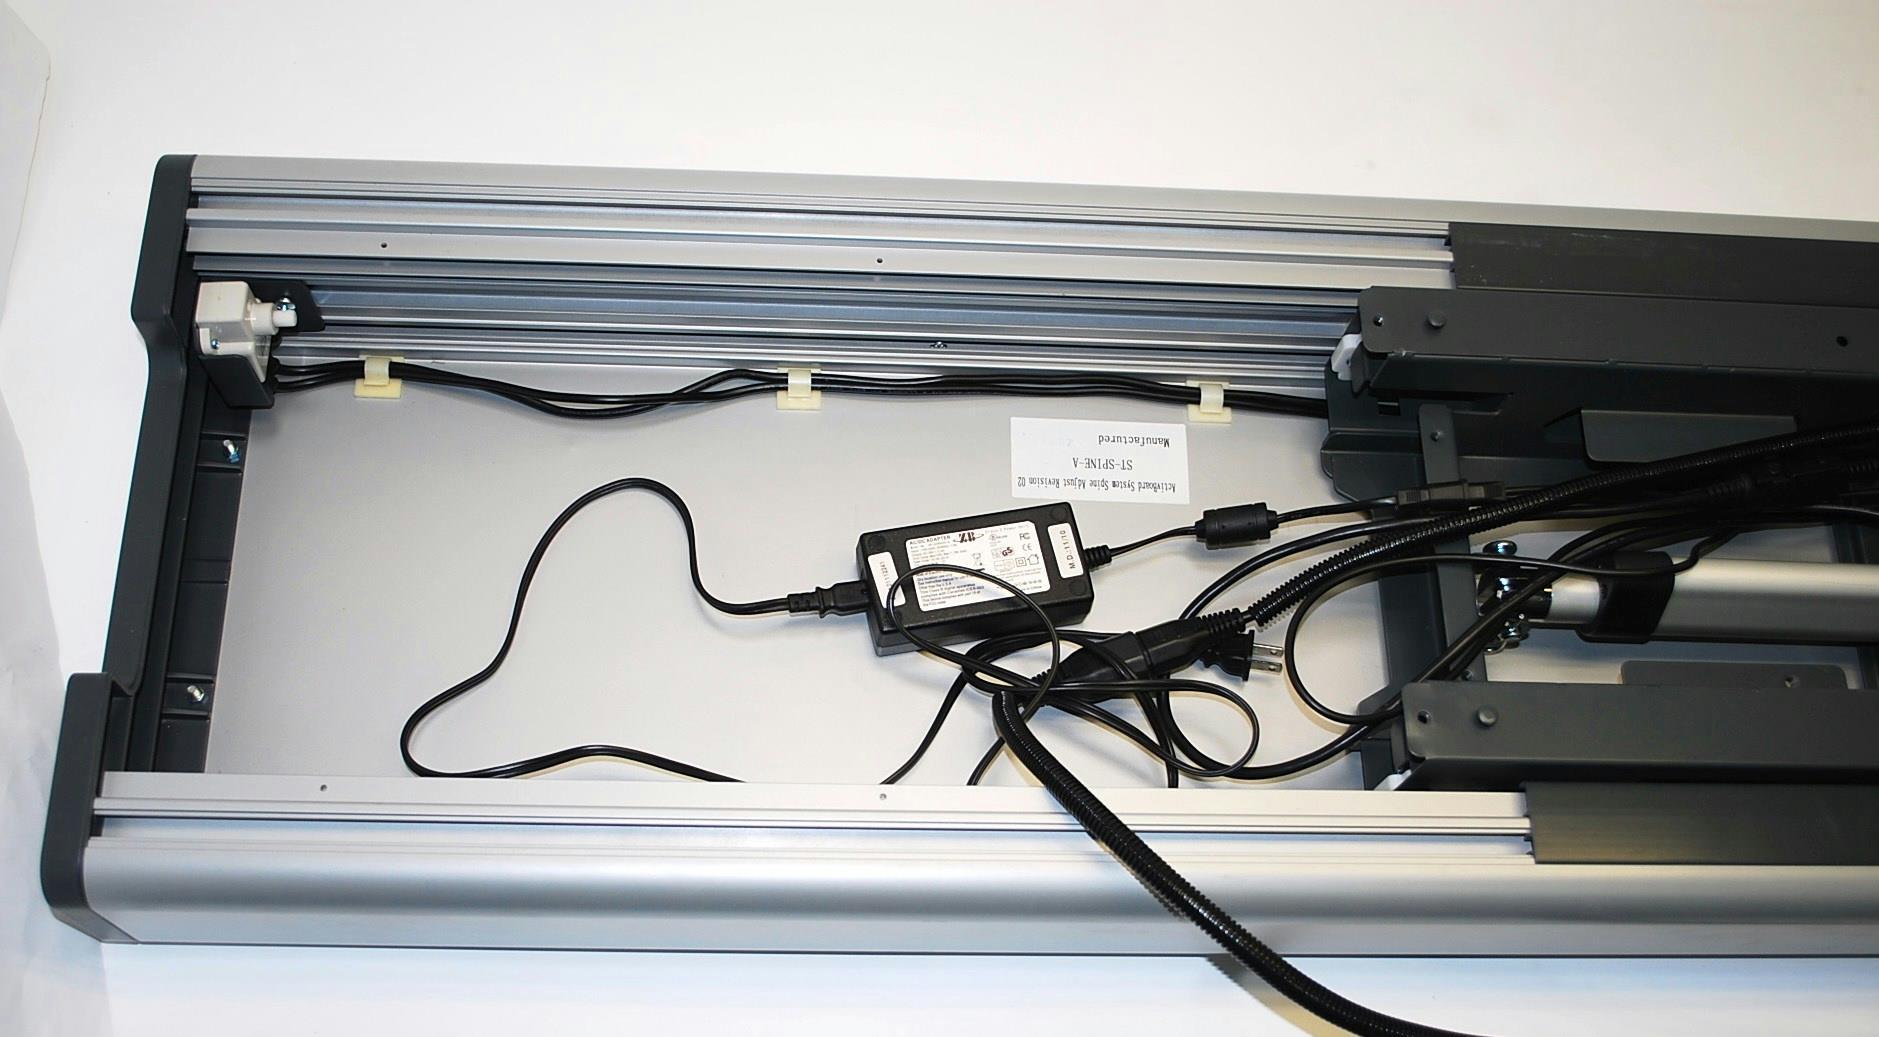 wiring promethean board library of wiring diagram u2022 rh jessascott co Promethean Board Clip Art Promethean Board Clip Art